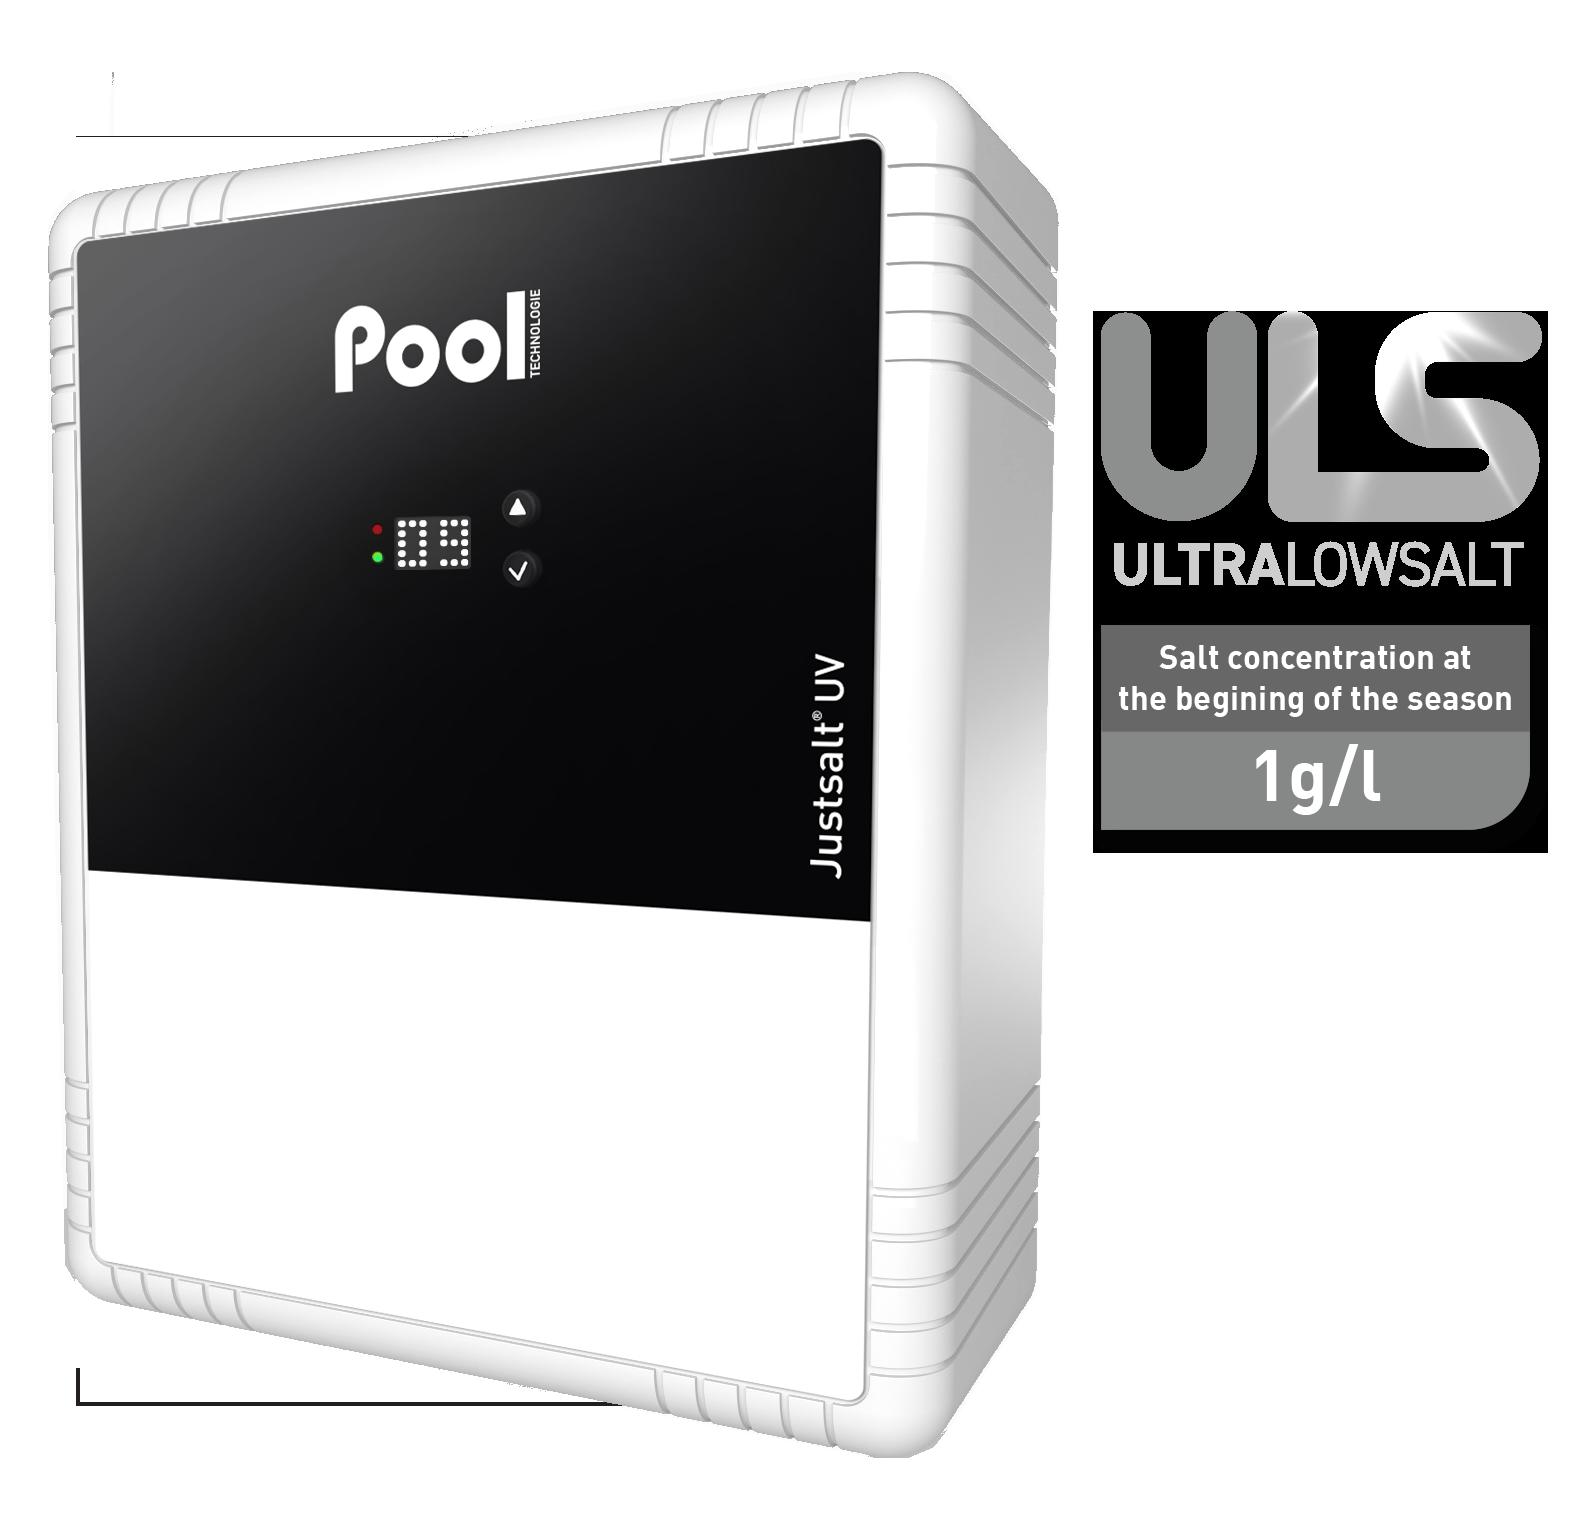 Justsalt UV Ultra Low Salt saltwater chlorinator UV steriliser